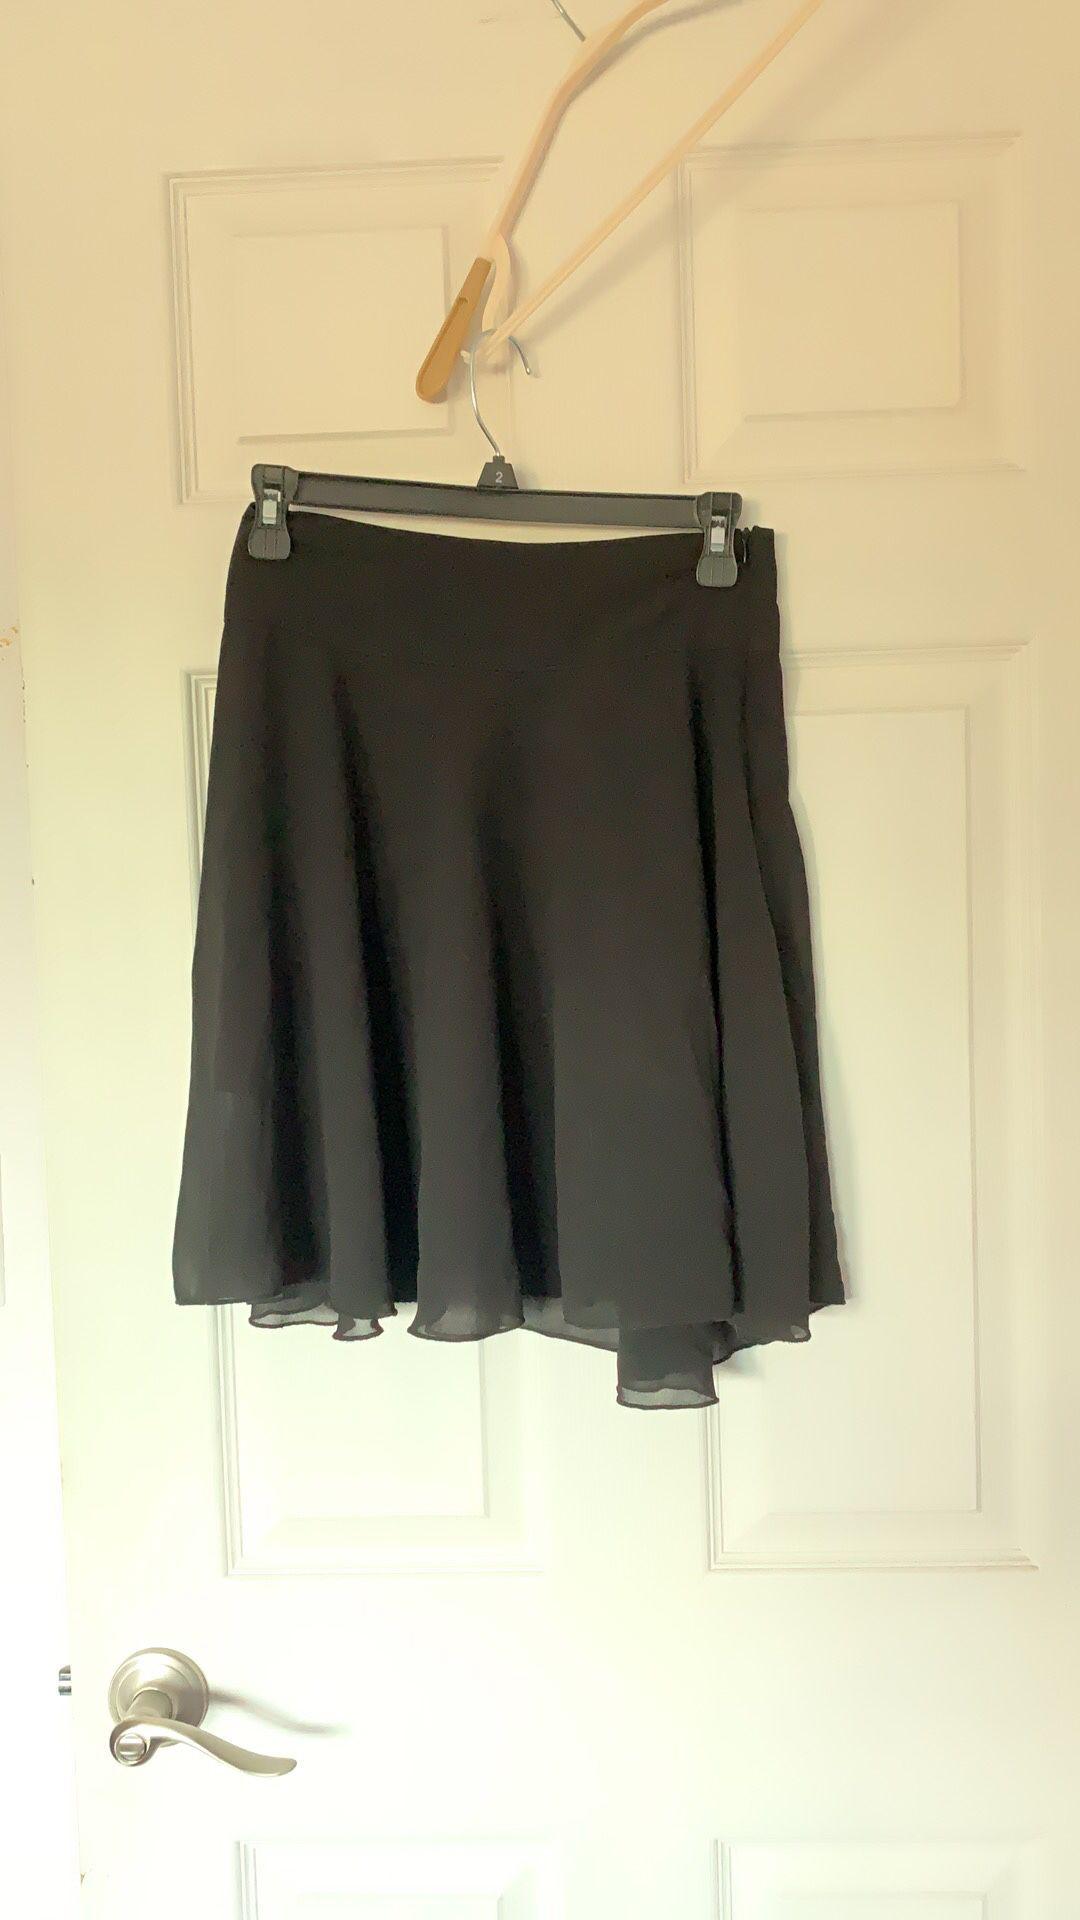 Skirt size 0-2